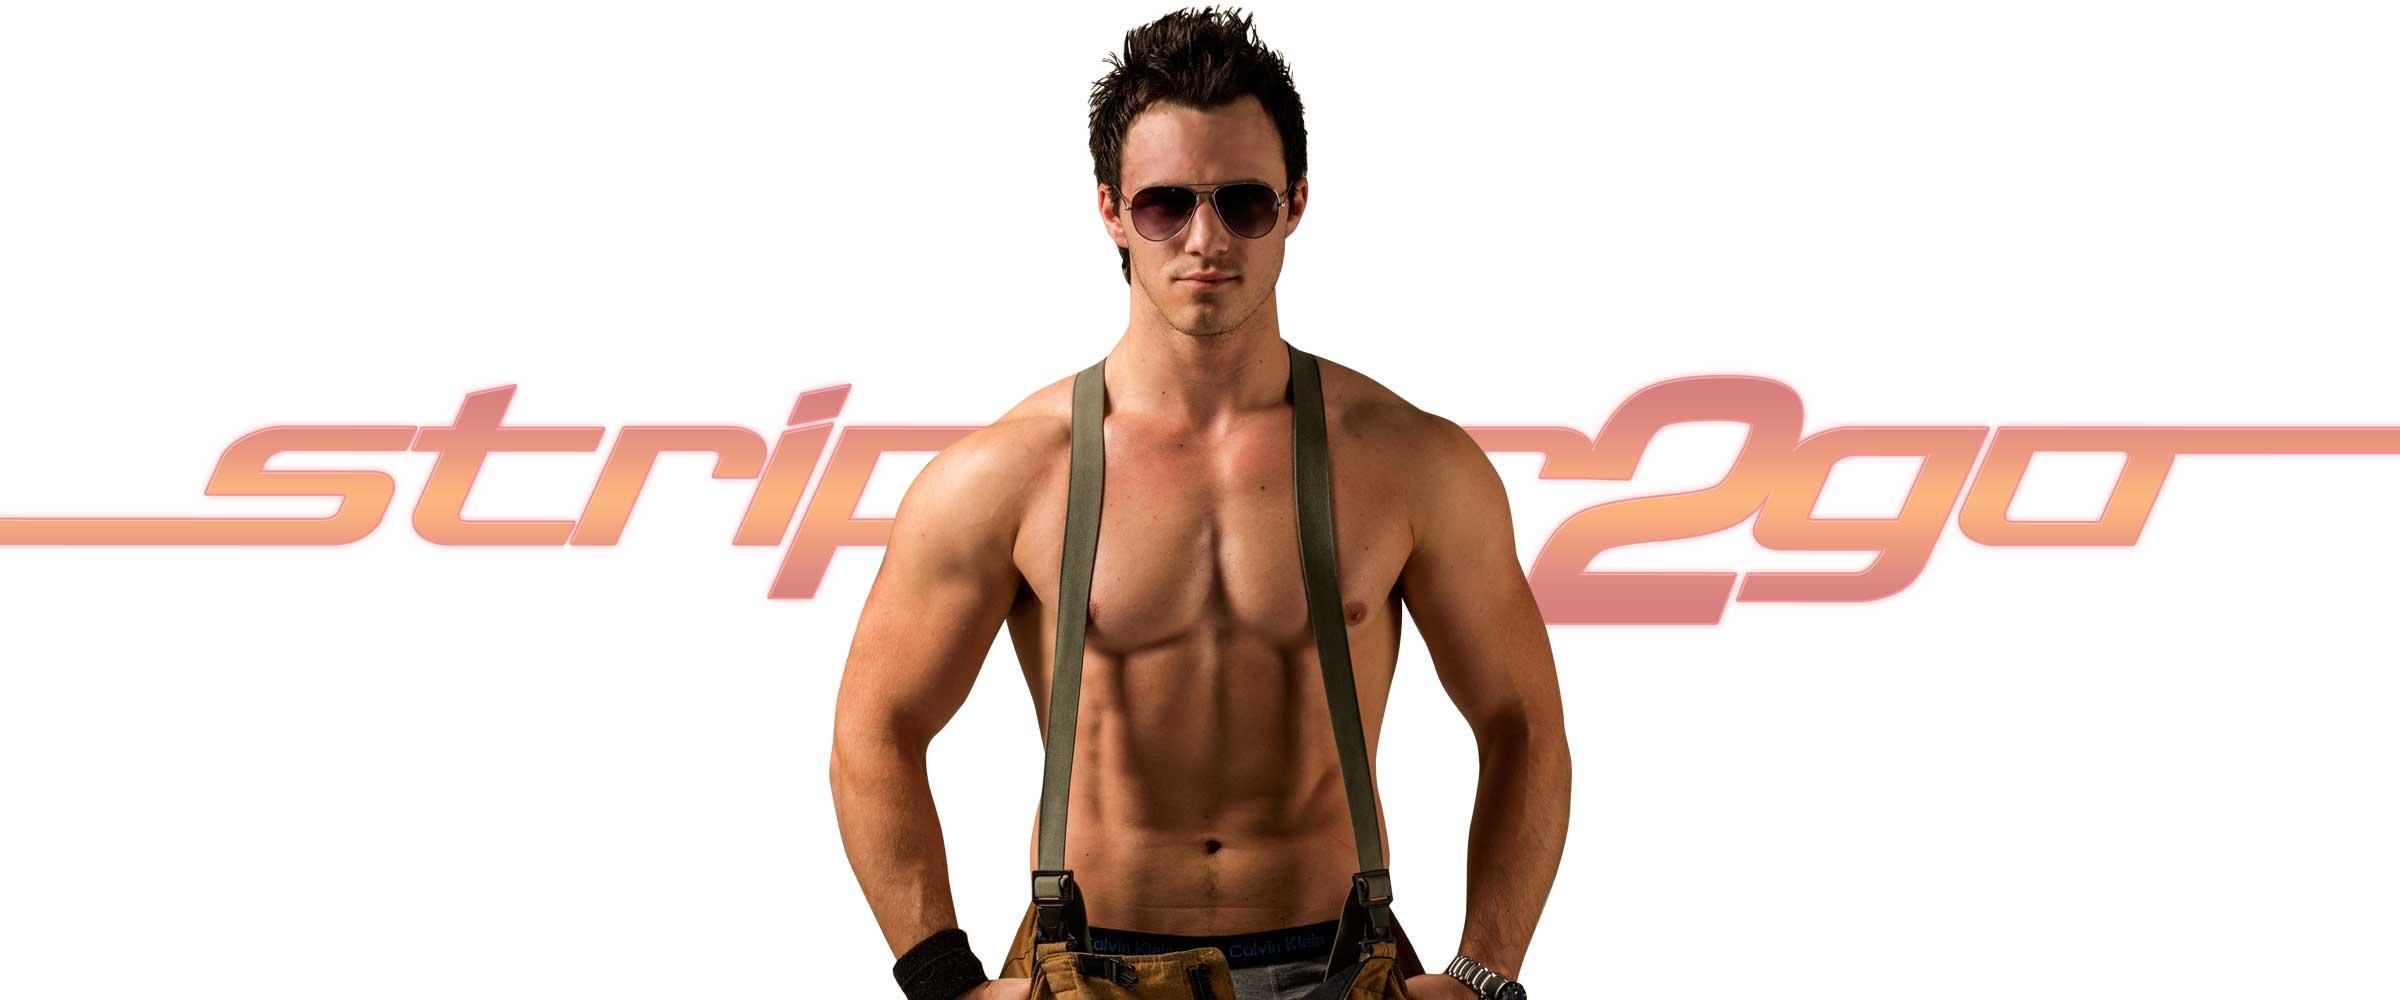 Auckland male stripper